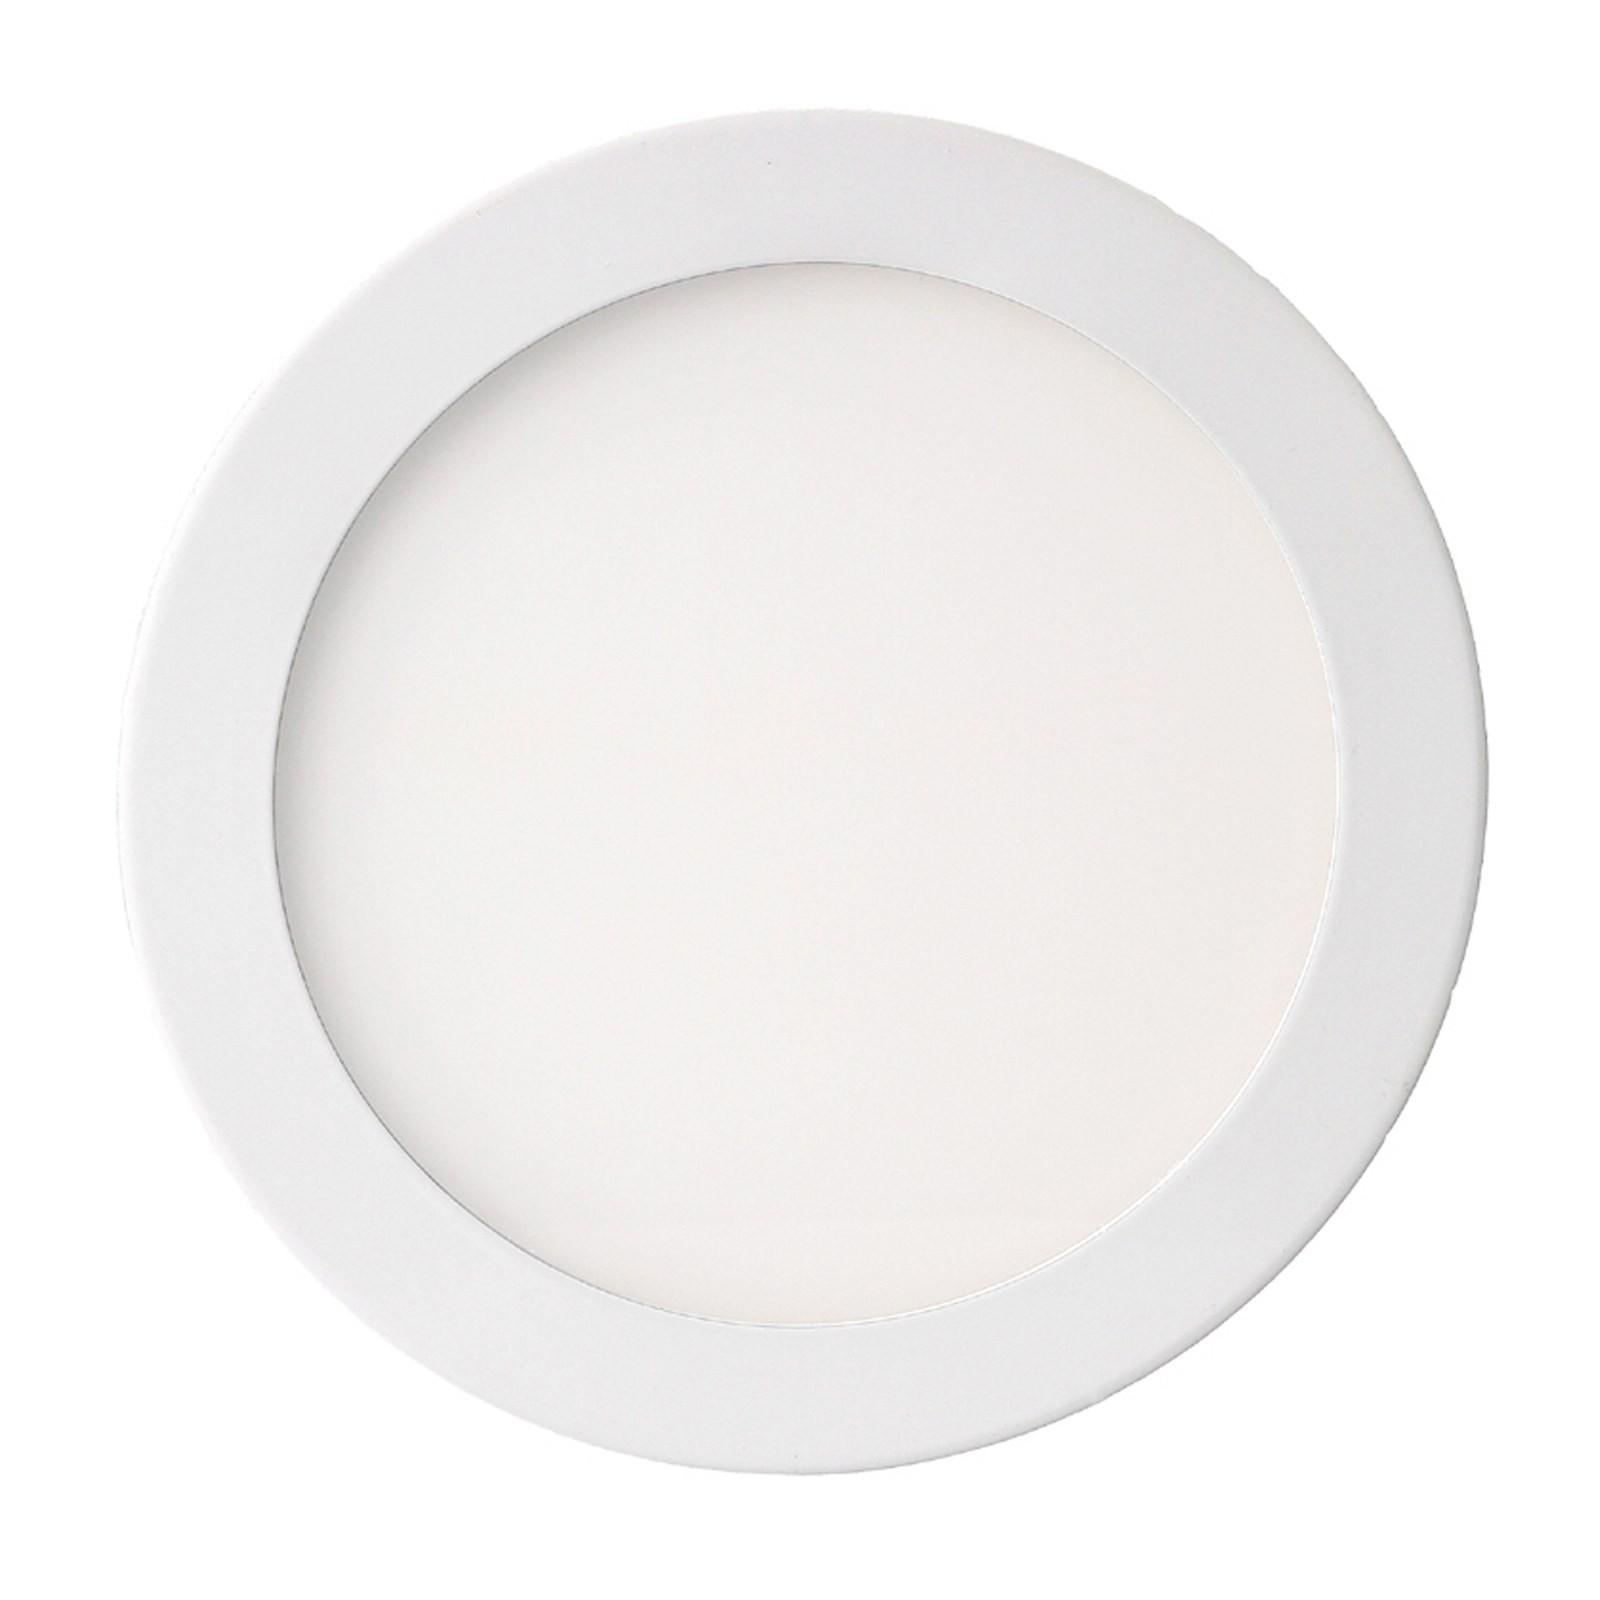 Faro faretto pannello led luce bianca calda 25 watt for Luce bianca led